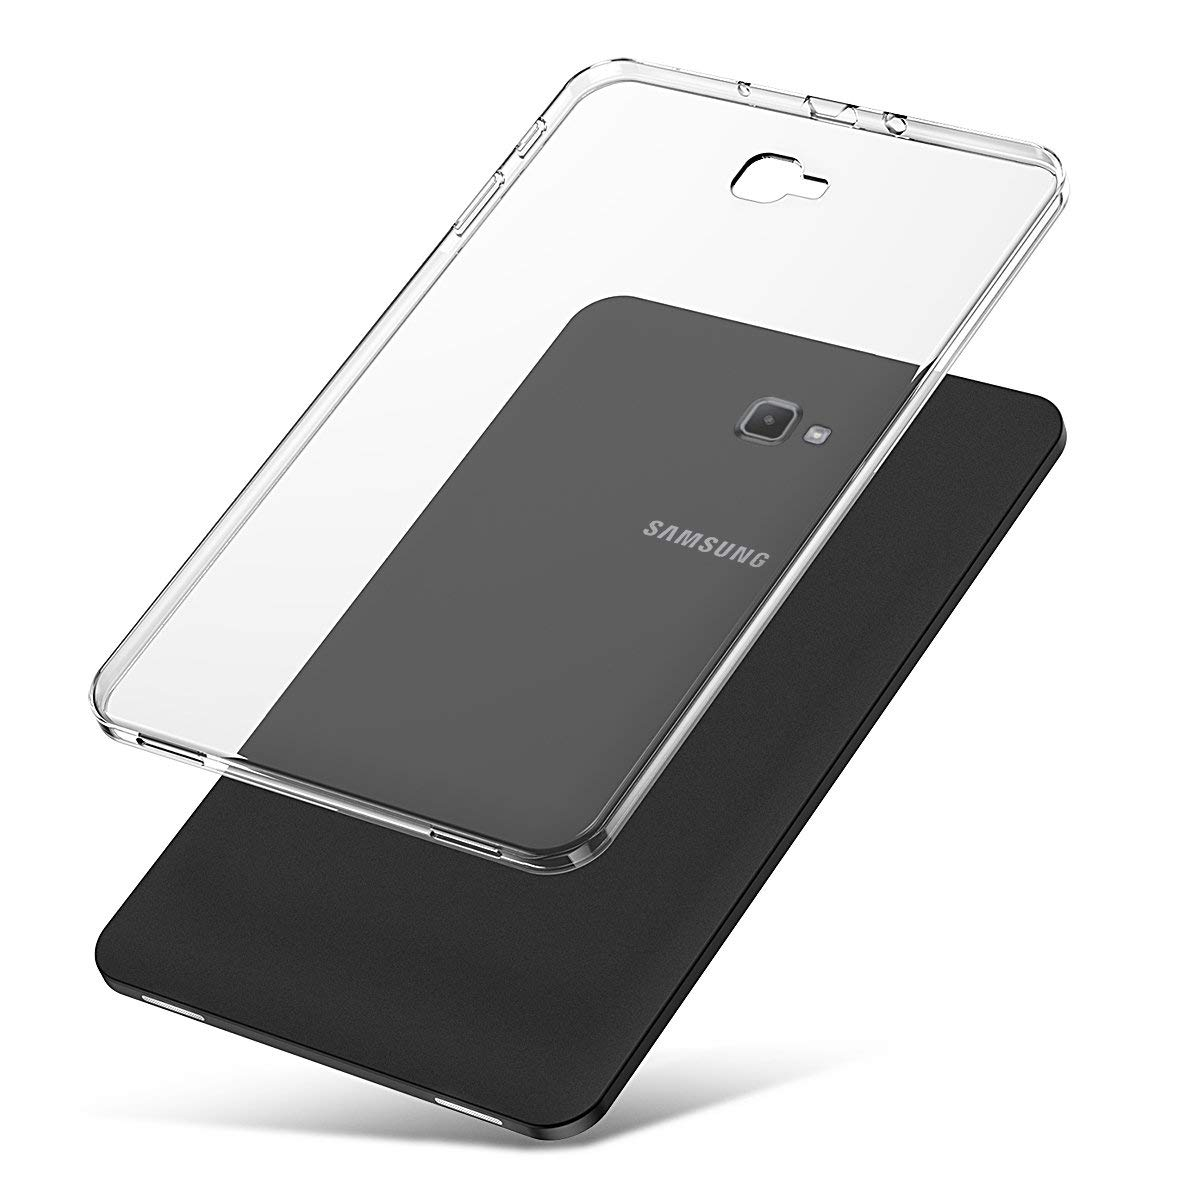 J&D ケース Galaxy Tab A 10.1用ケース [スリムクッション] [軽量バンパー] [落下保護] 耐衝撃 TPUラバースリム タブレットバックカバー Samsung Galaxy Tab A 10.1インチ SM-T580用 GalaxyTabA10.1-PBTPU-TM  透明 B07NZMS8ZP